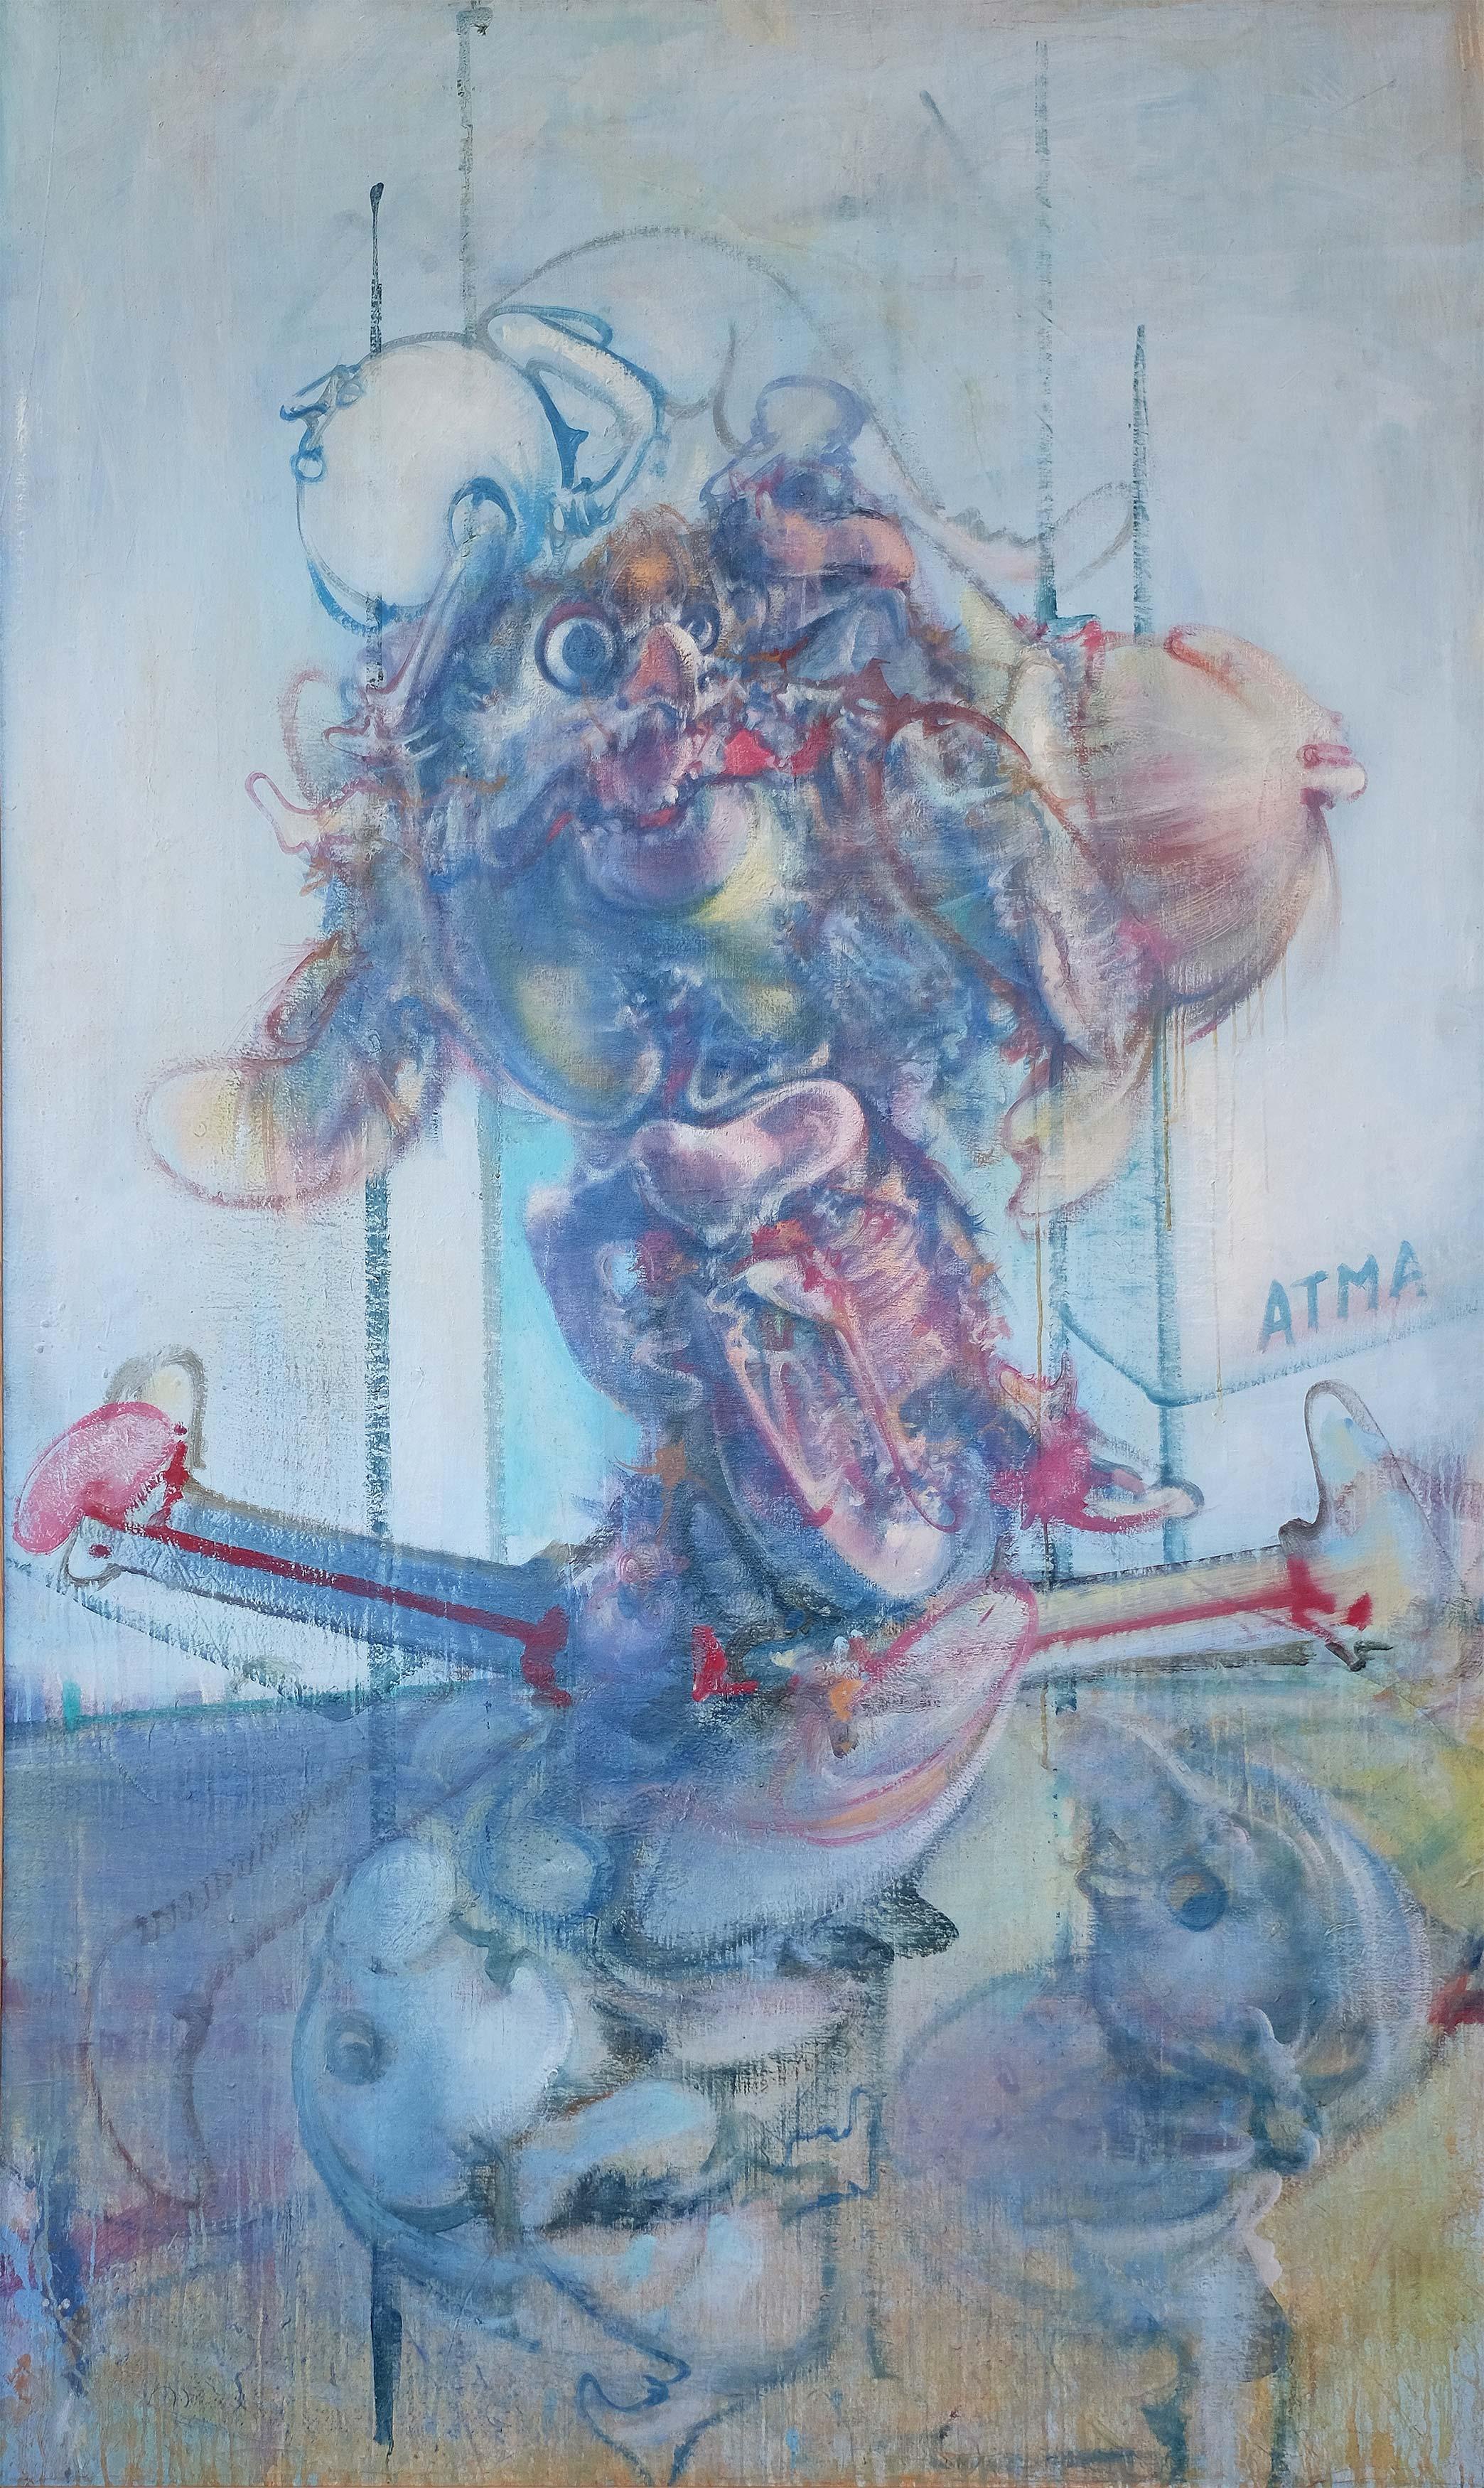 Atma, 1988